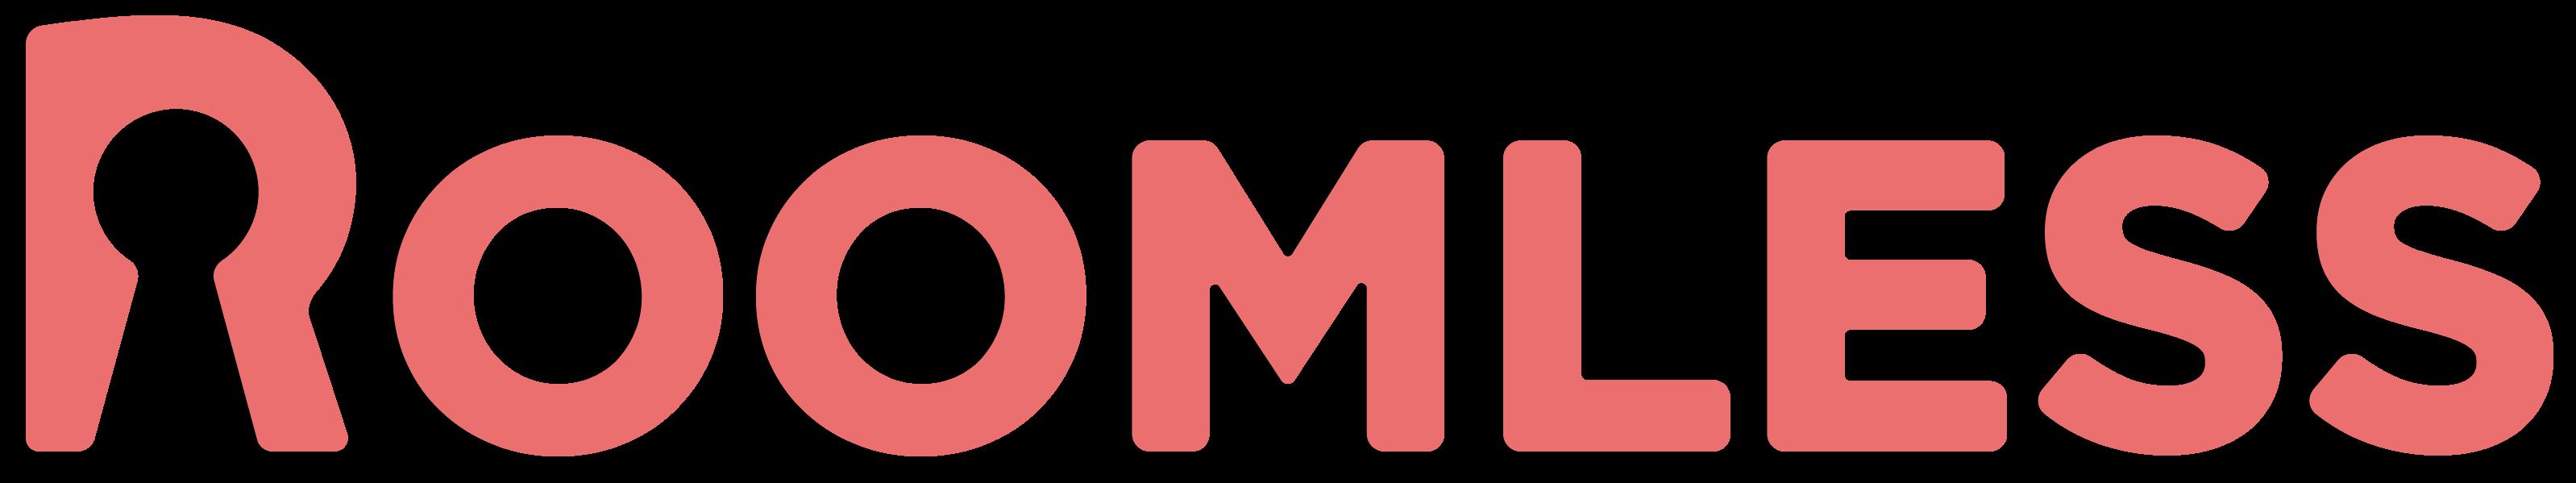 Roomless – Blog